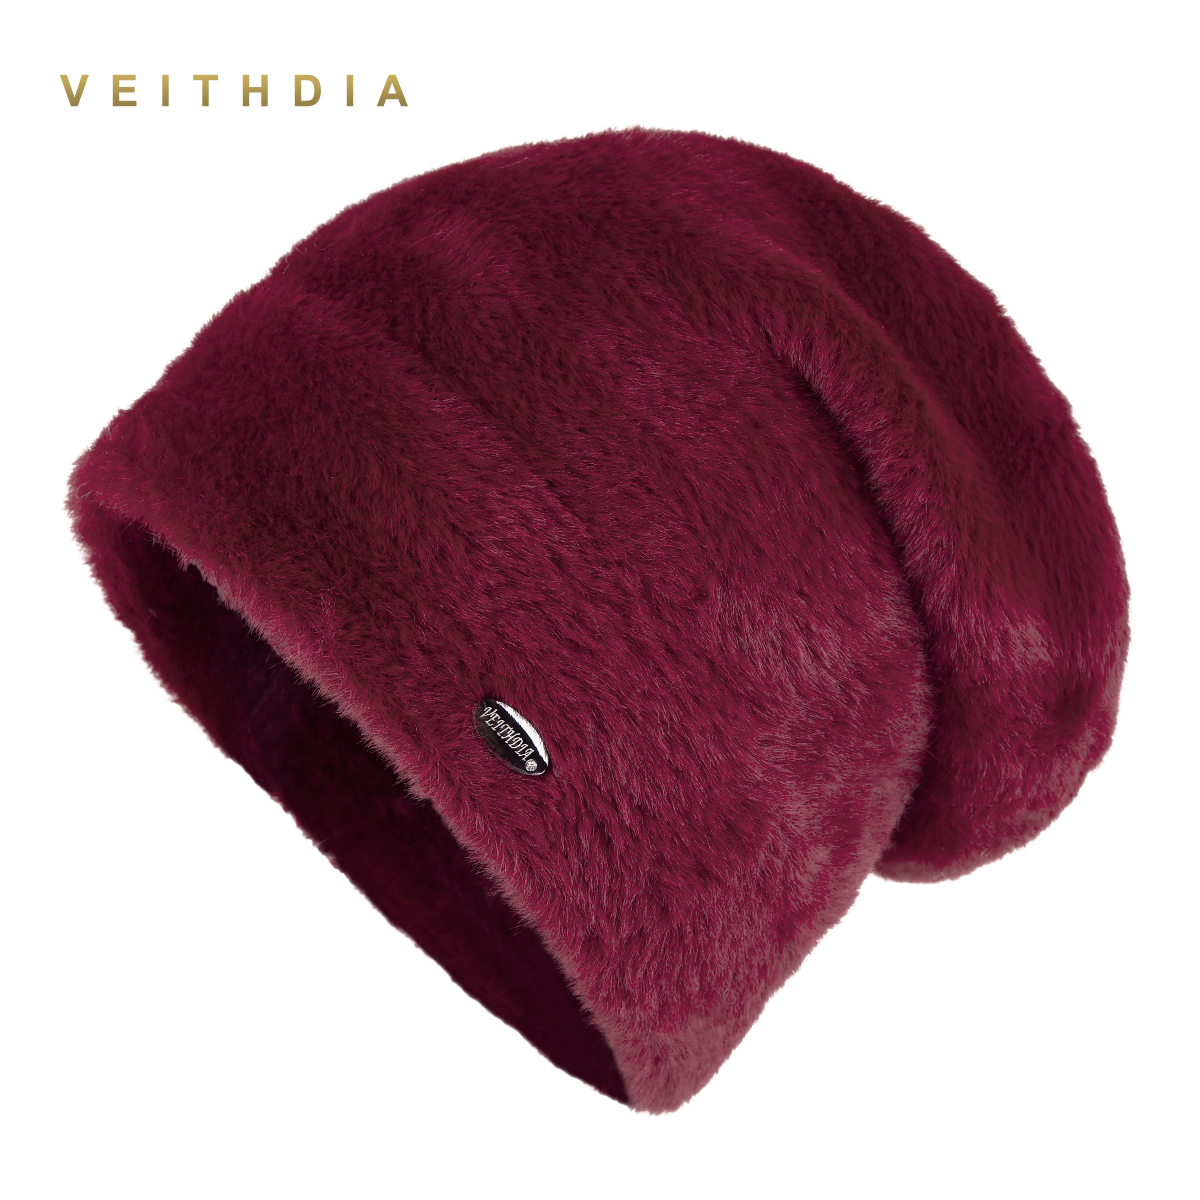 VEITHDIA High Quality Women Winter Hats Fashion Rabbit Velvet Knitted Like Mink Fur Hat Female Girl Double Thickening Beanies